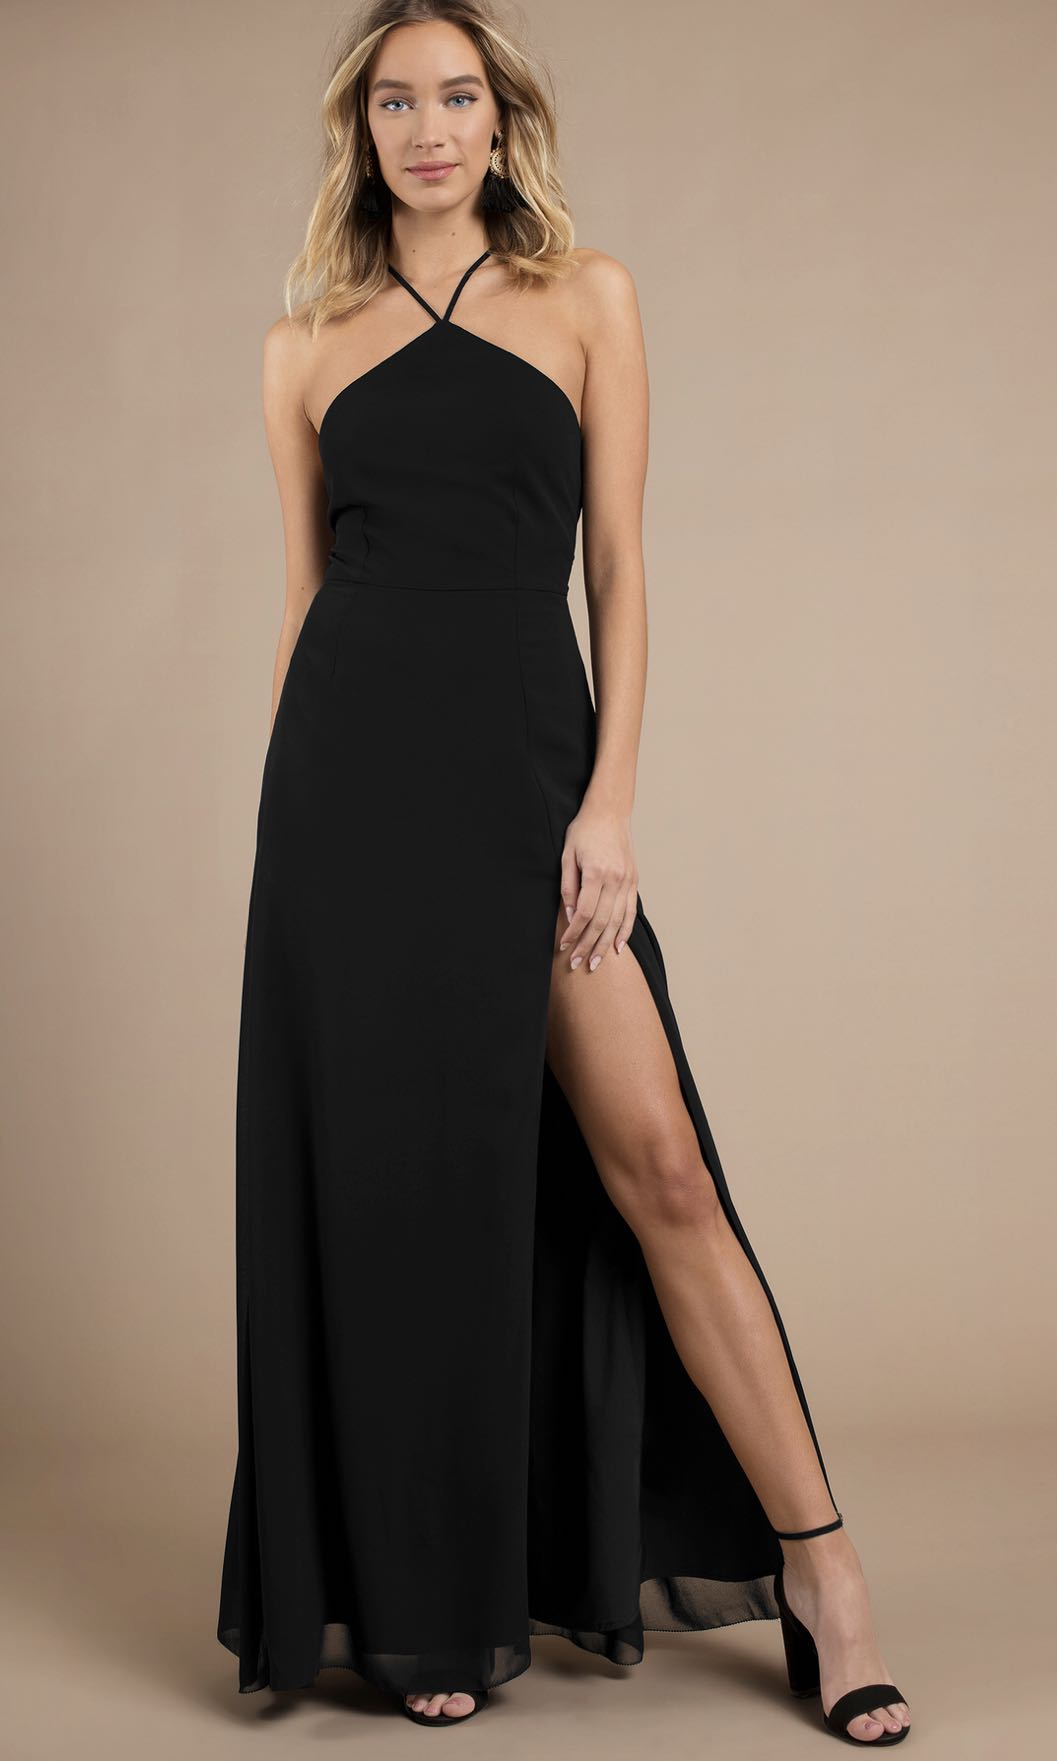 b35845ee410 Tobi rise above black maxi dress, Women's Fashion, Clothes, Dresses &  Skirts on Carousell